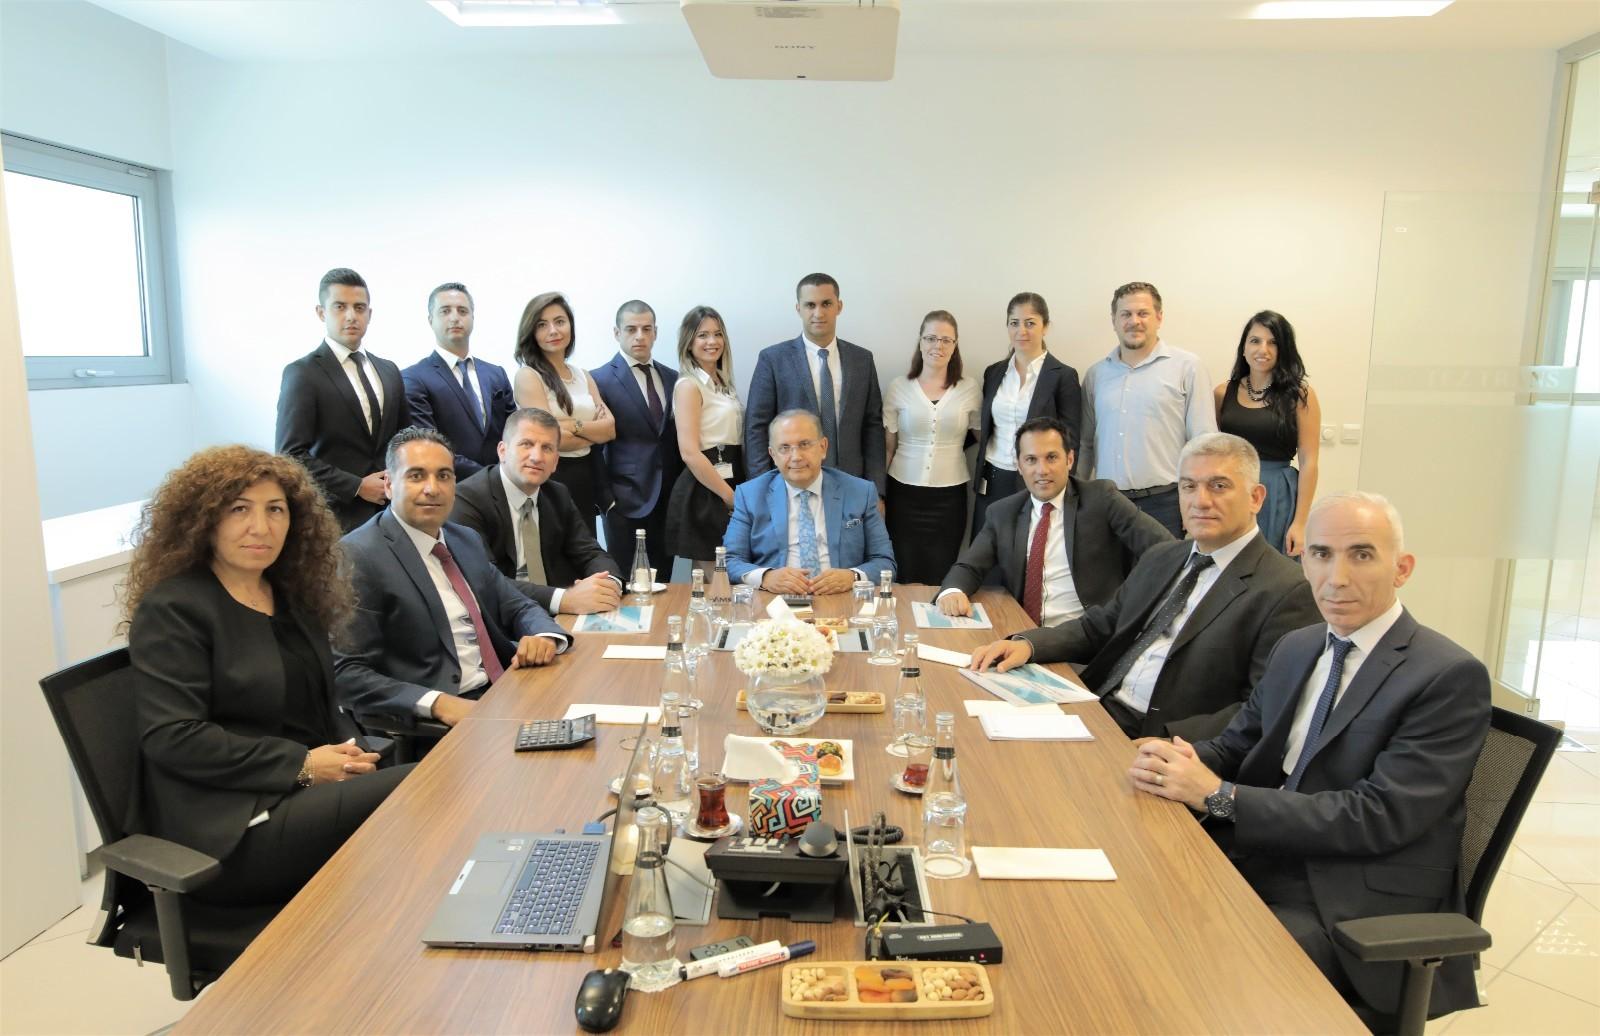 The Chairman Mr. Sonay Gürgen Visited the Logistics Center - Haberler - TezTrans Lojistik